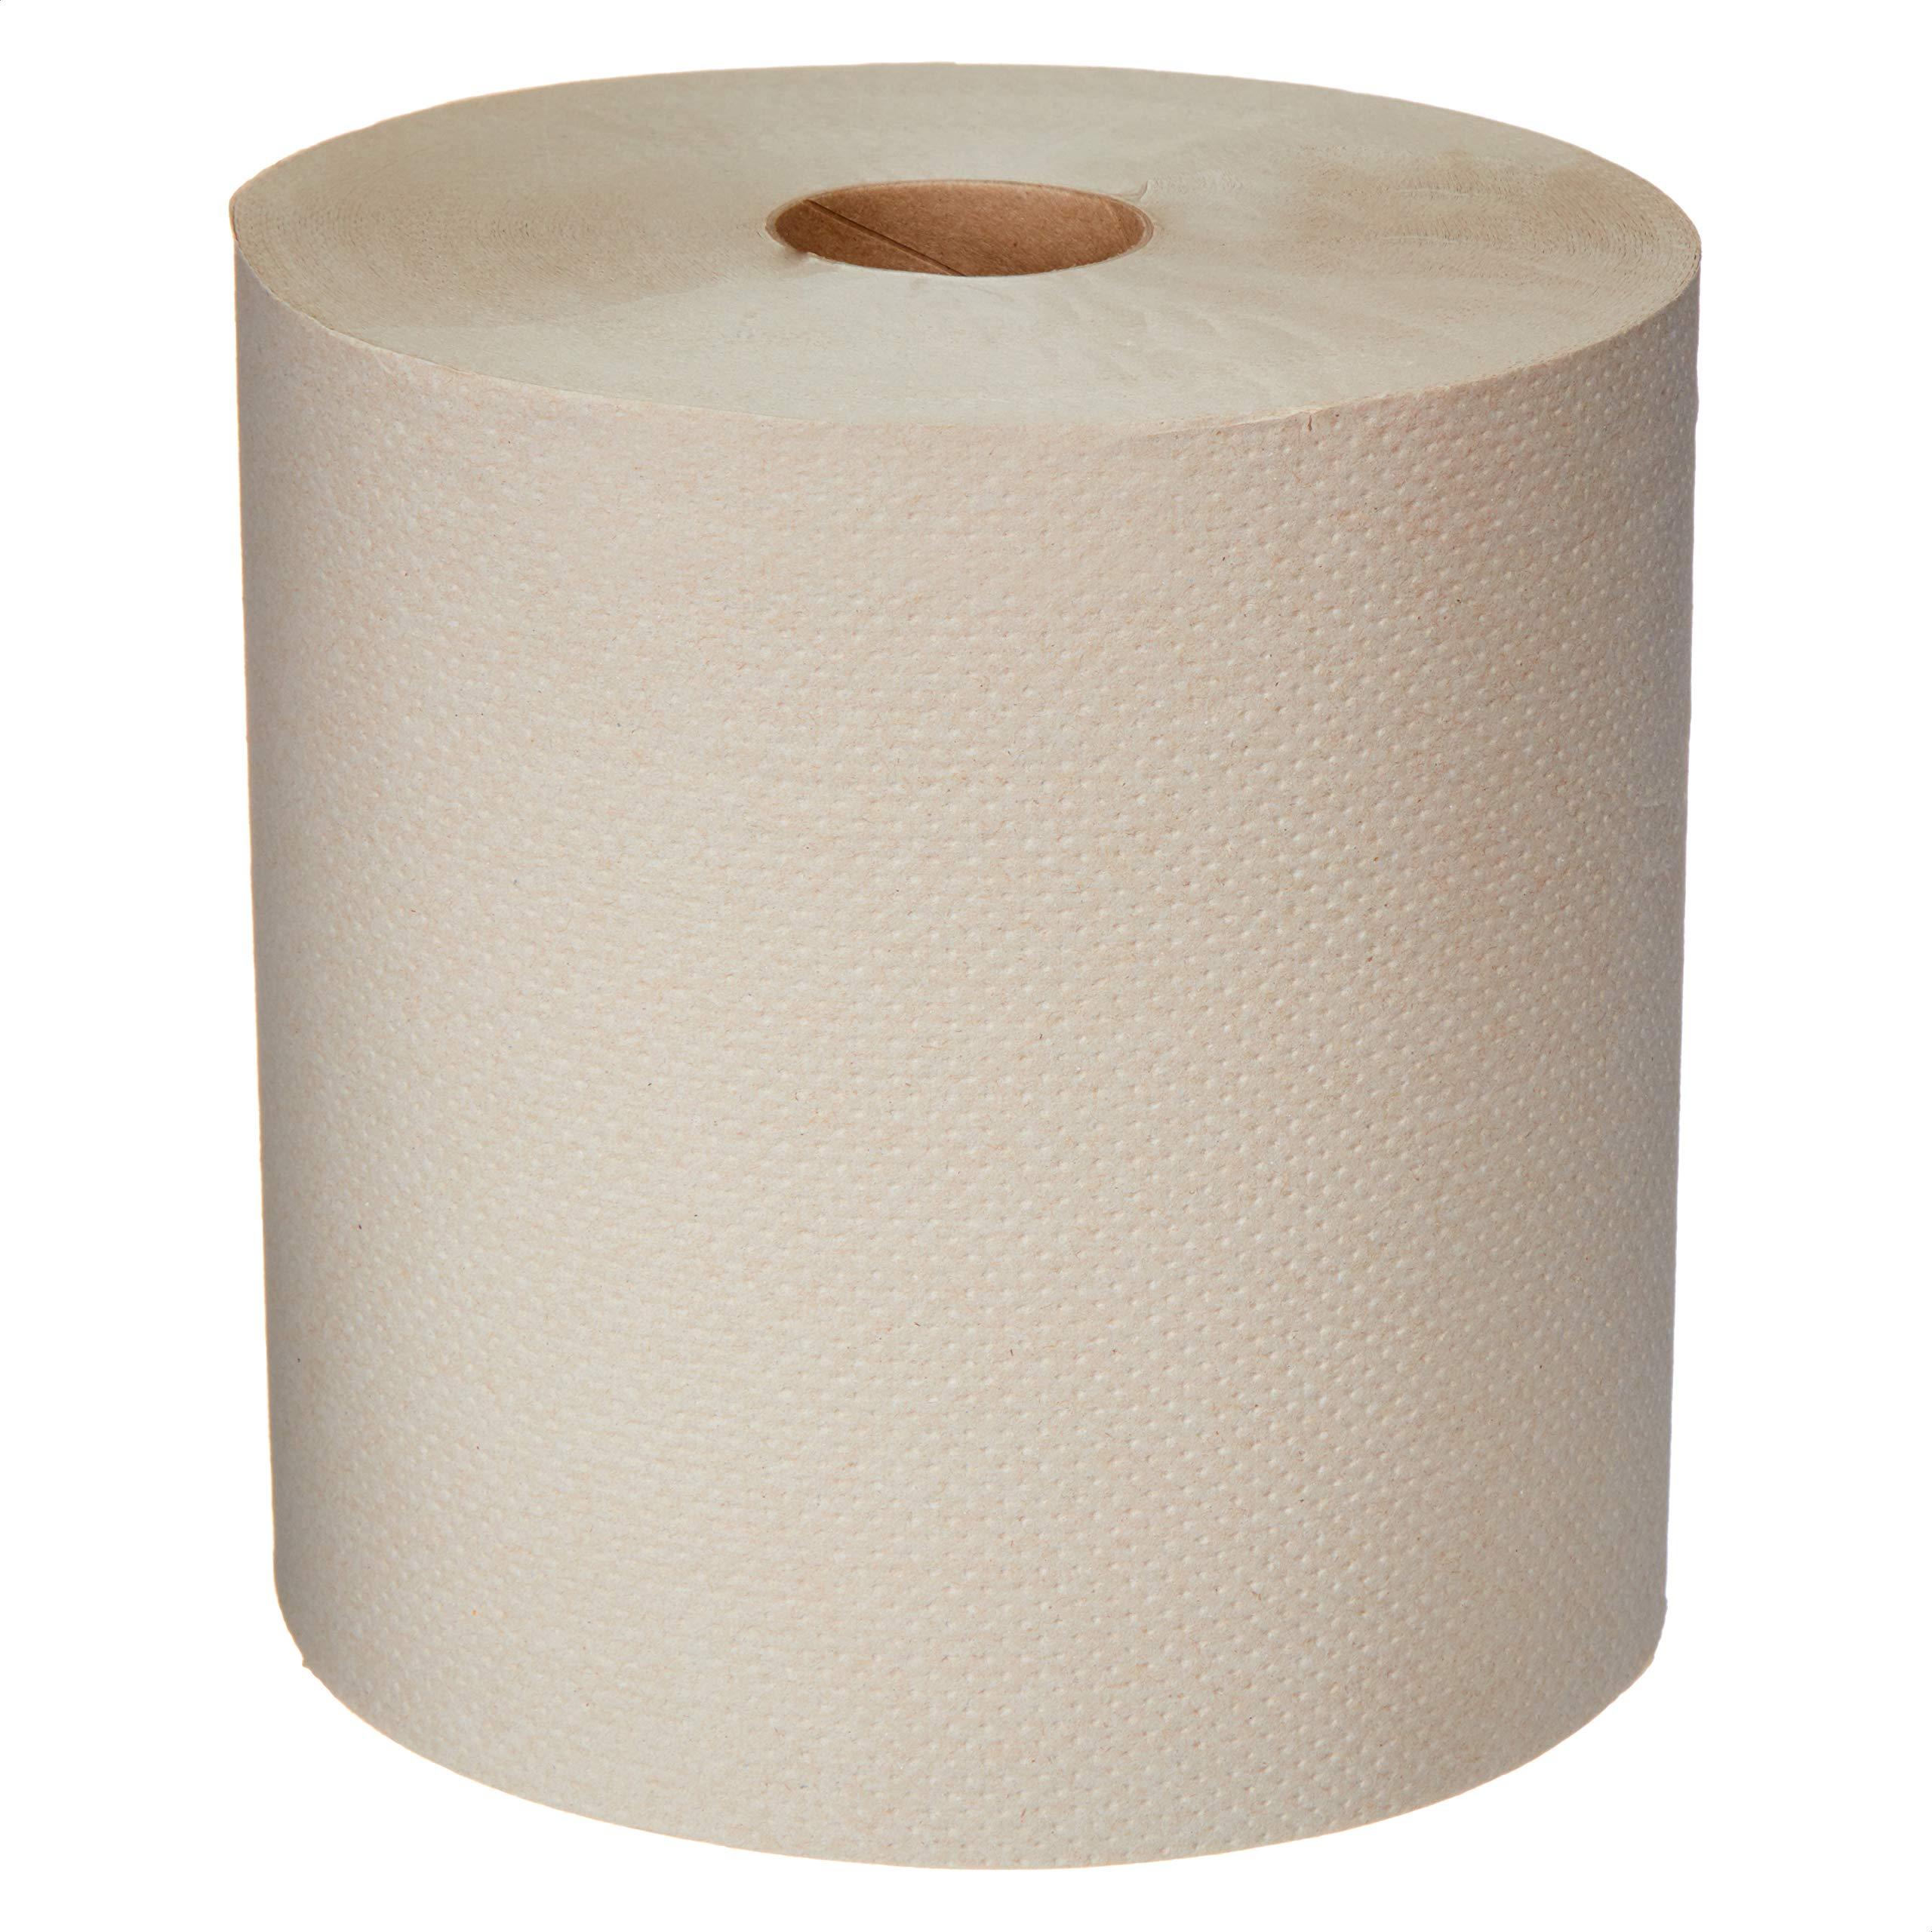 AmazonCommercial Kraft Hard Roll Towels, 800' per Roll, 6 Rolls